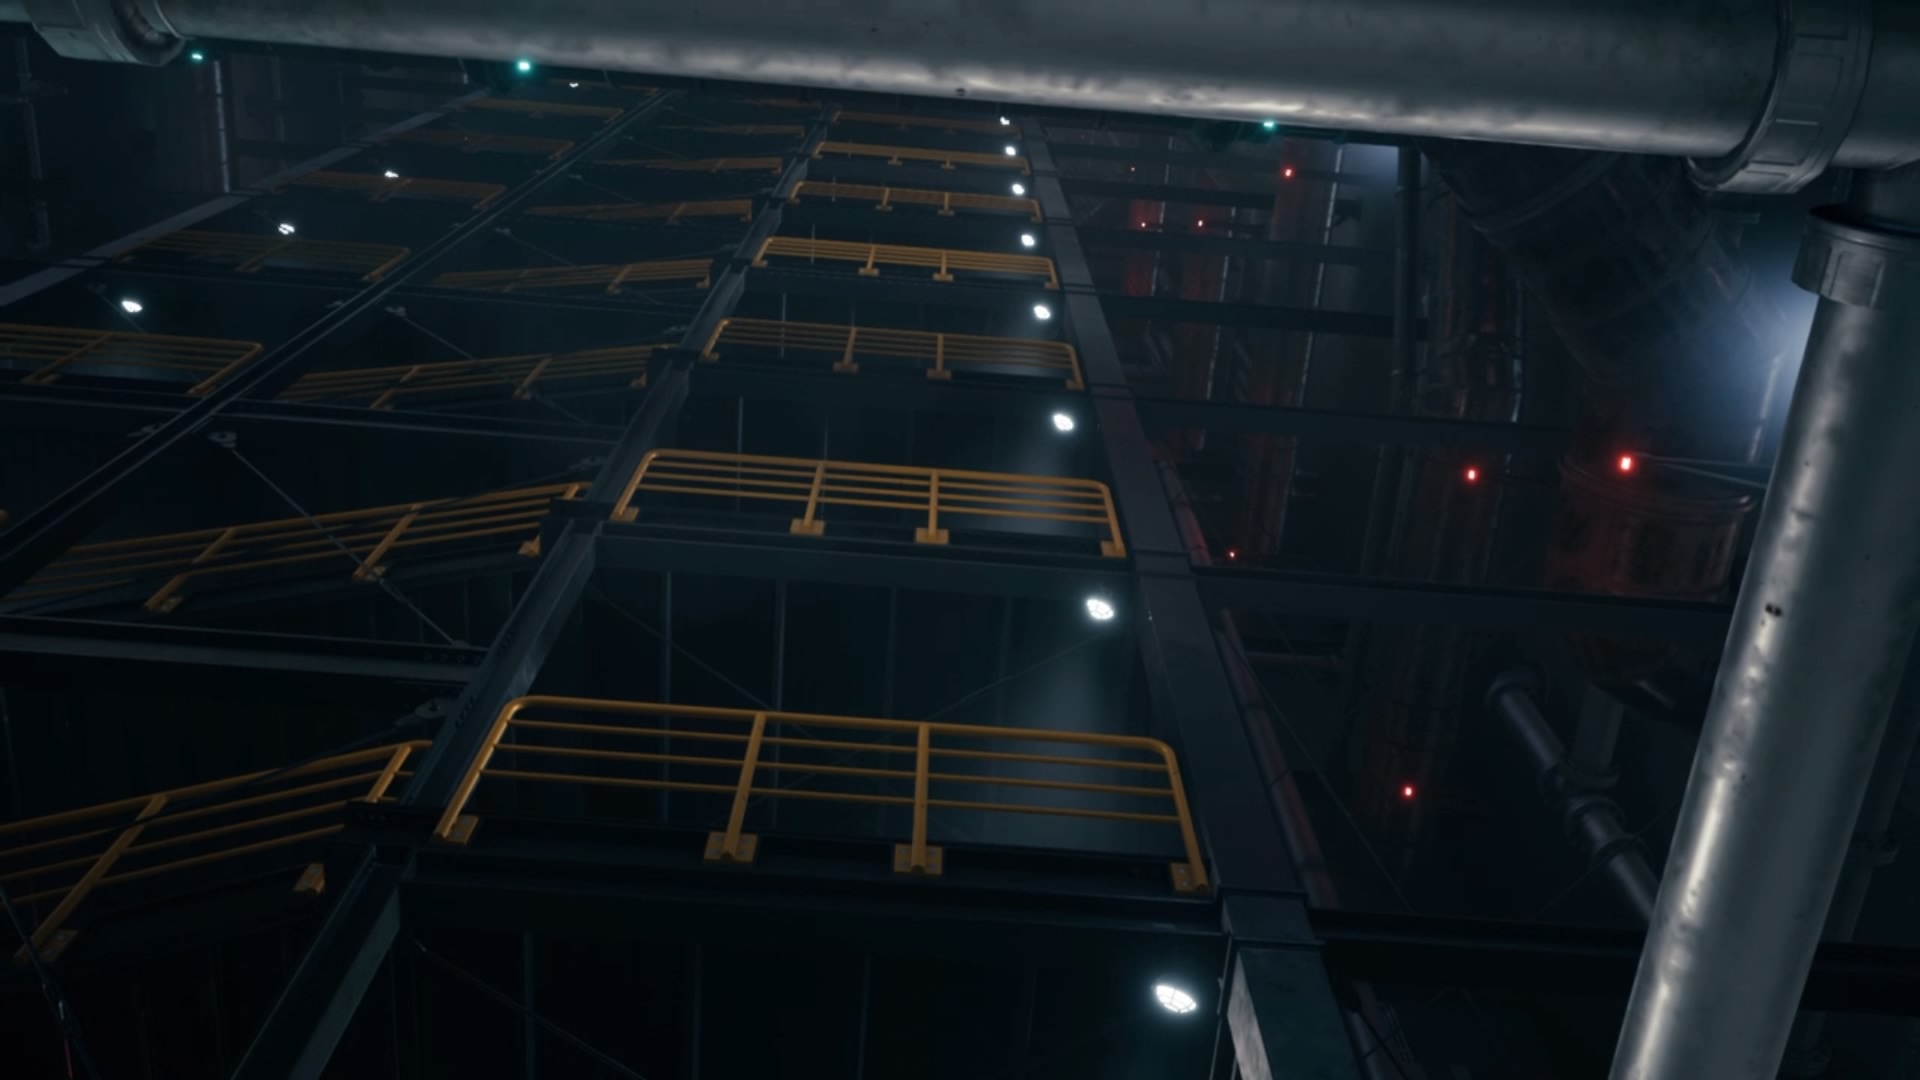 【FF7REMAKE】第62回攻略・感想:非常階段は続くよどこまでも